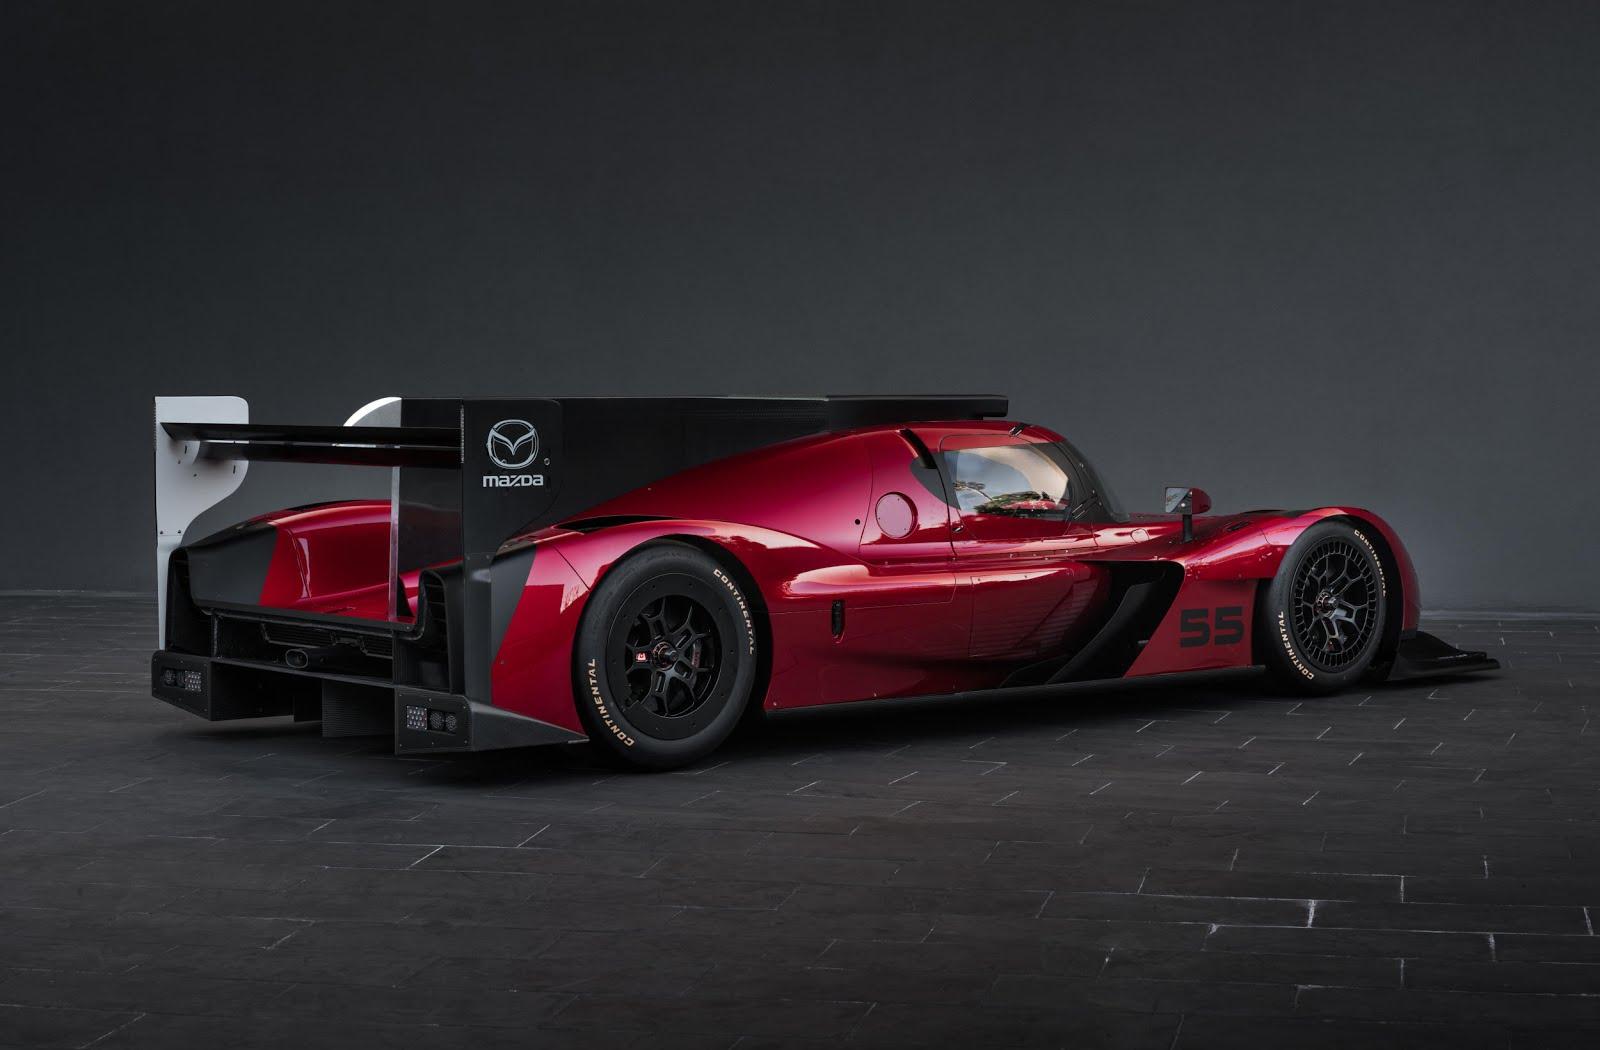 m e m o mazda rt24p prototype race car